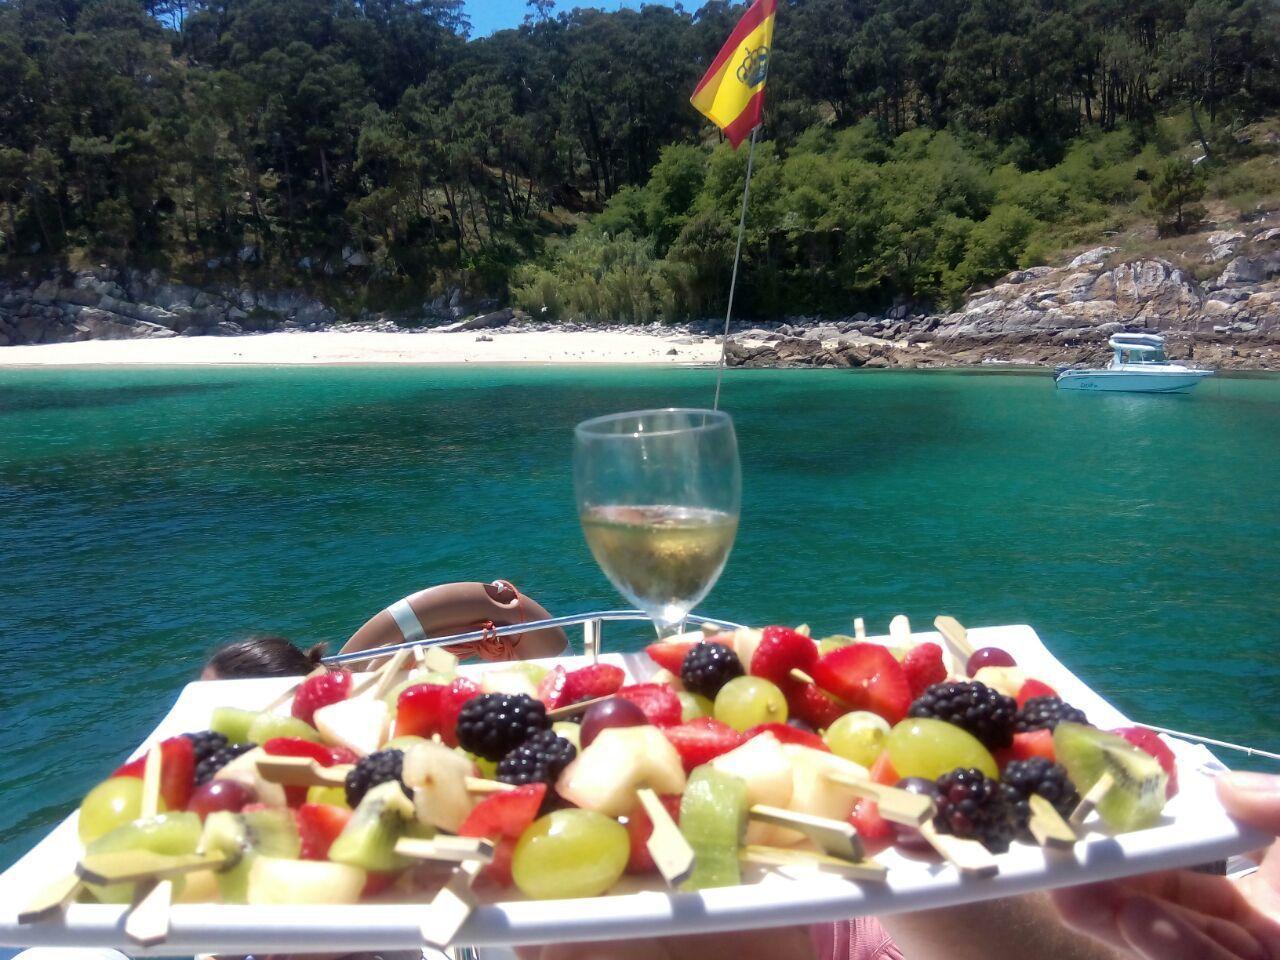 excursion_islas_cies_galicia_ria_vigo_sailway_sailing_holidays